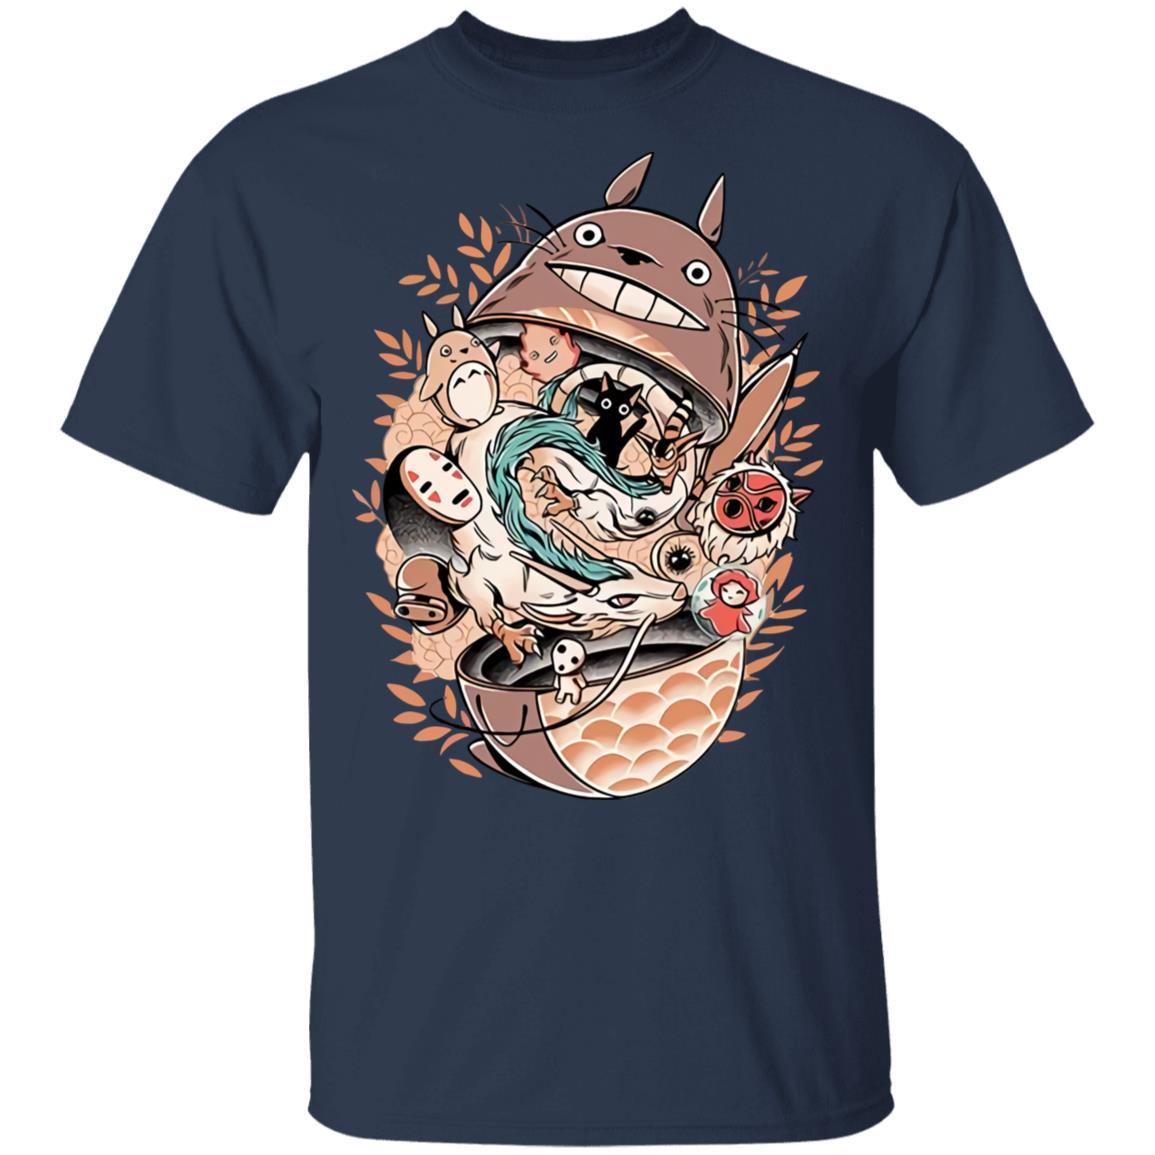 Totoro Daruma and Ghibli Friends T Shirt